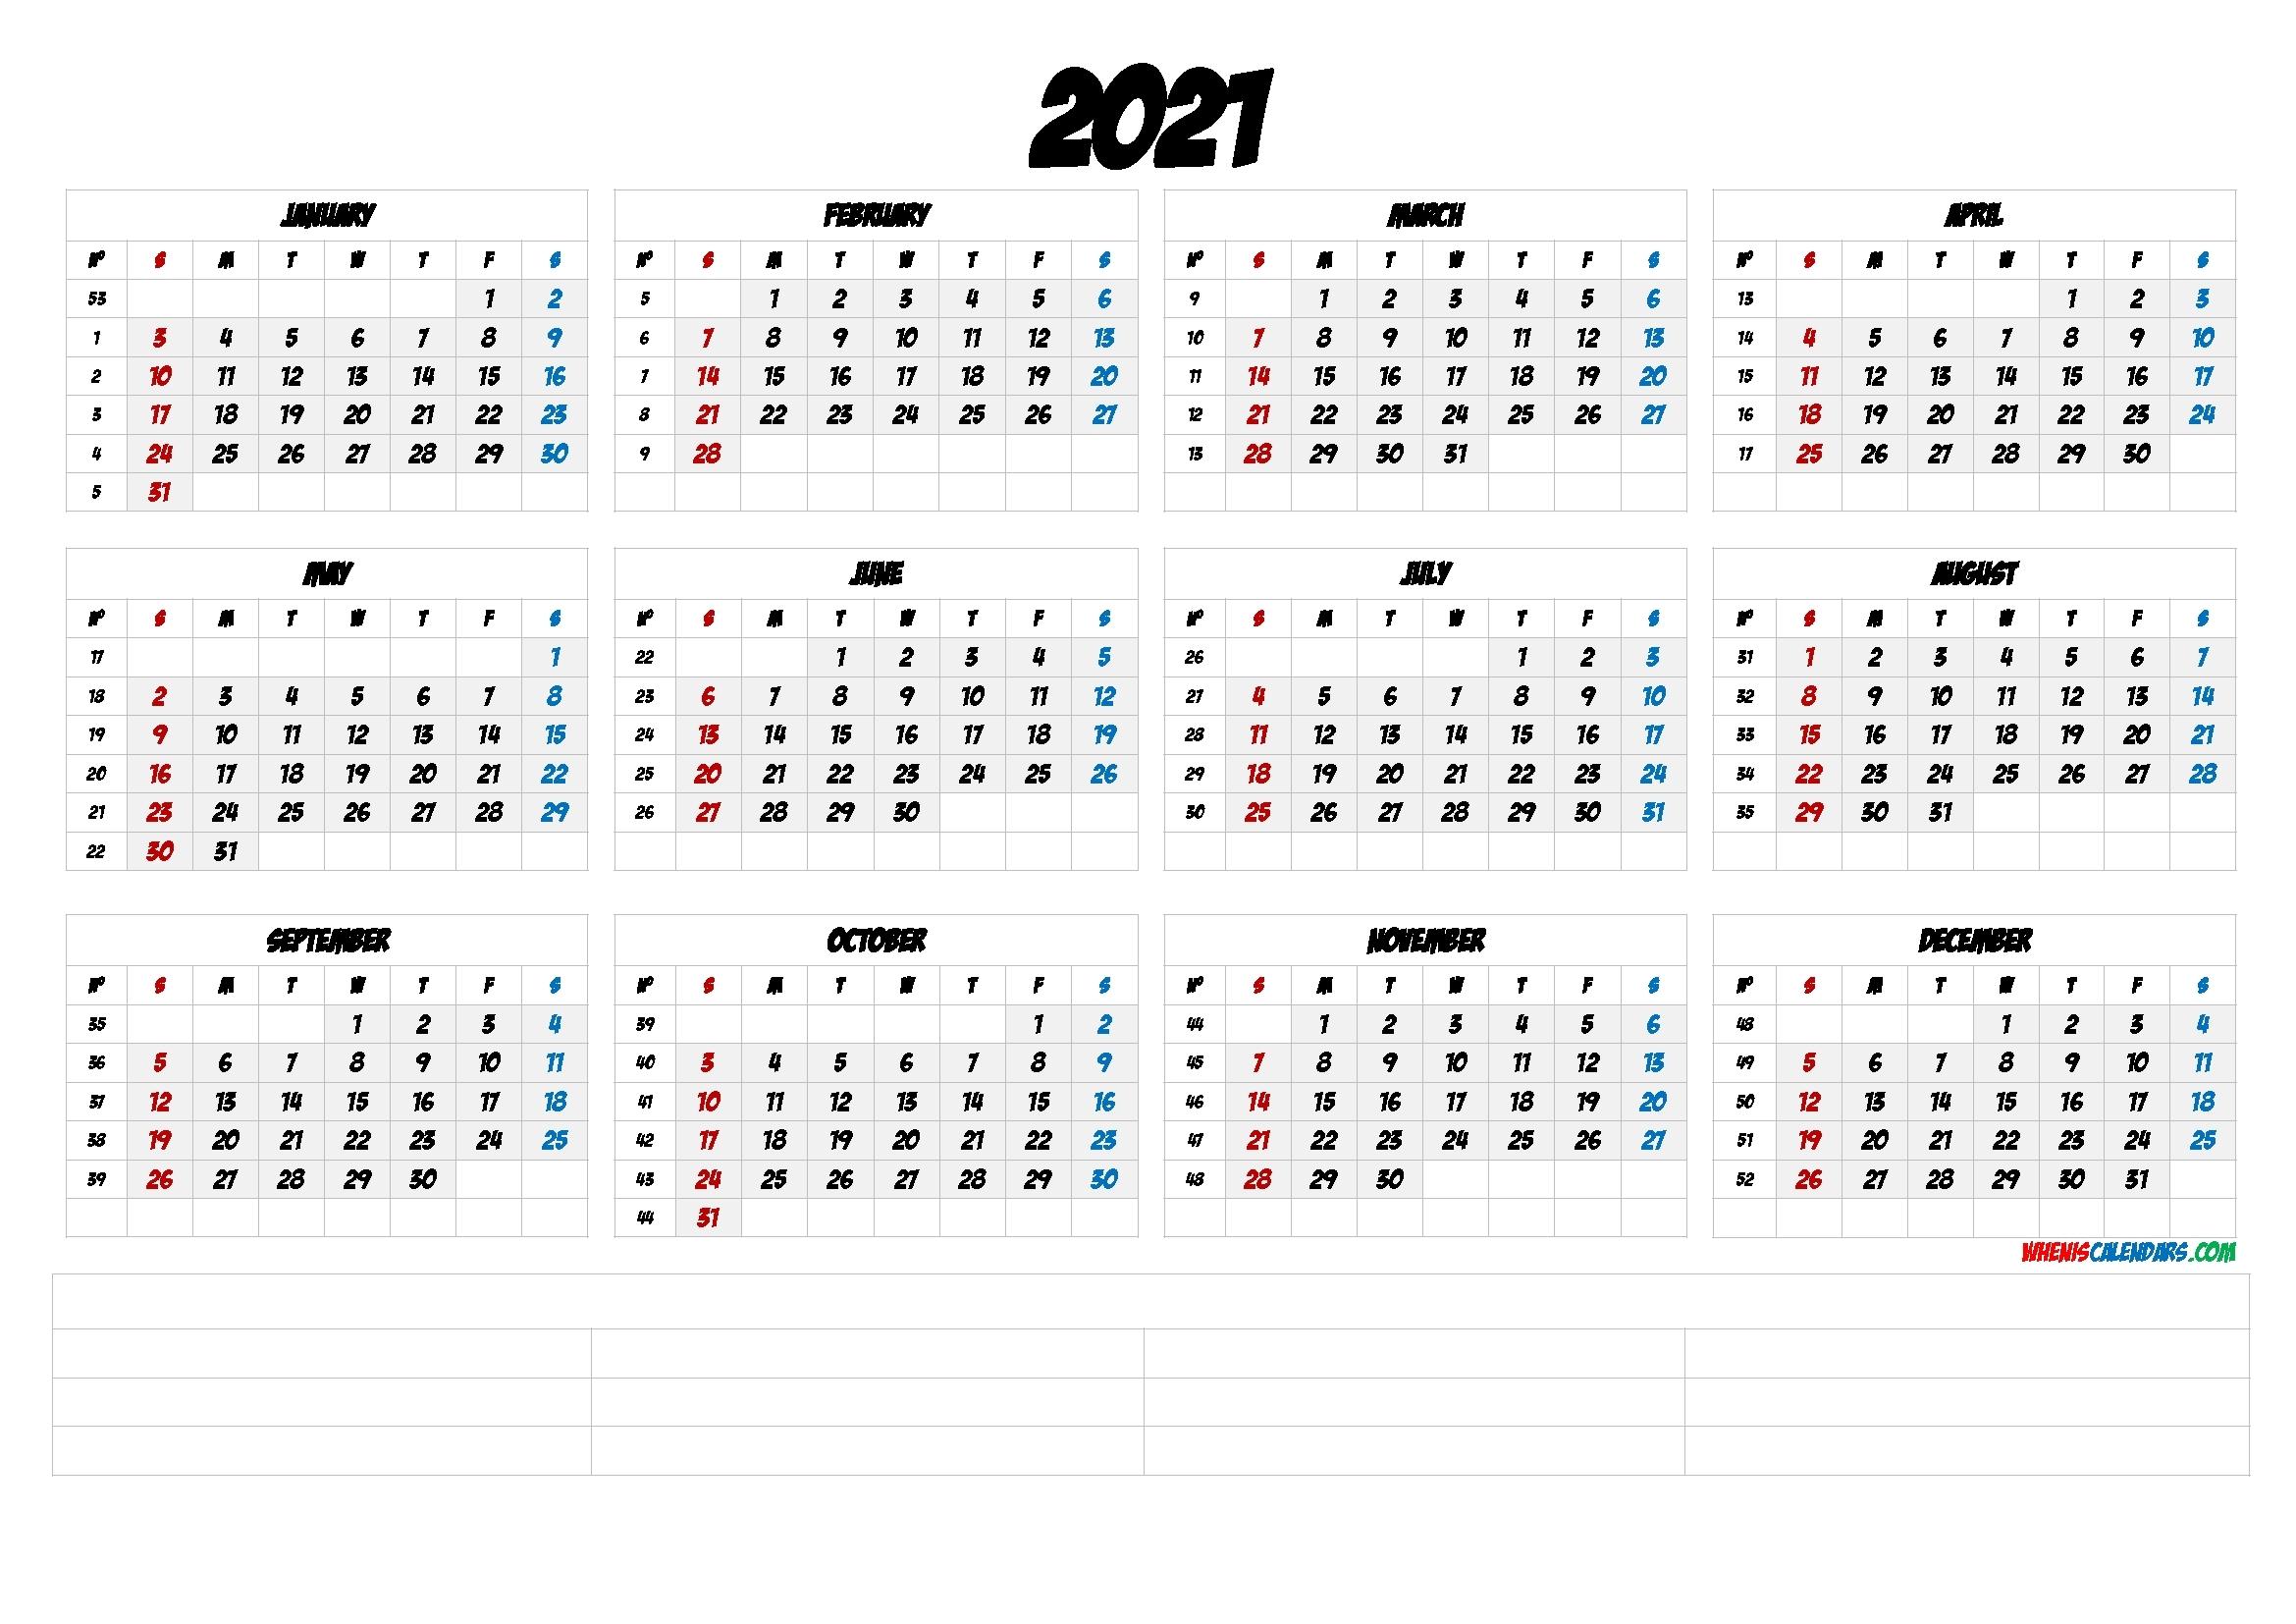 Free Printable 2021 Yearly Calendar With Week Numbers (6 Templates) - Free Printable 2020